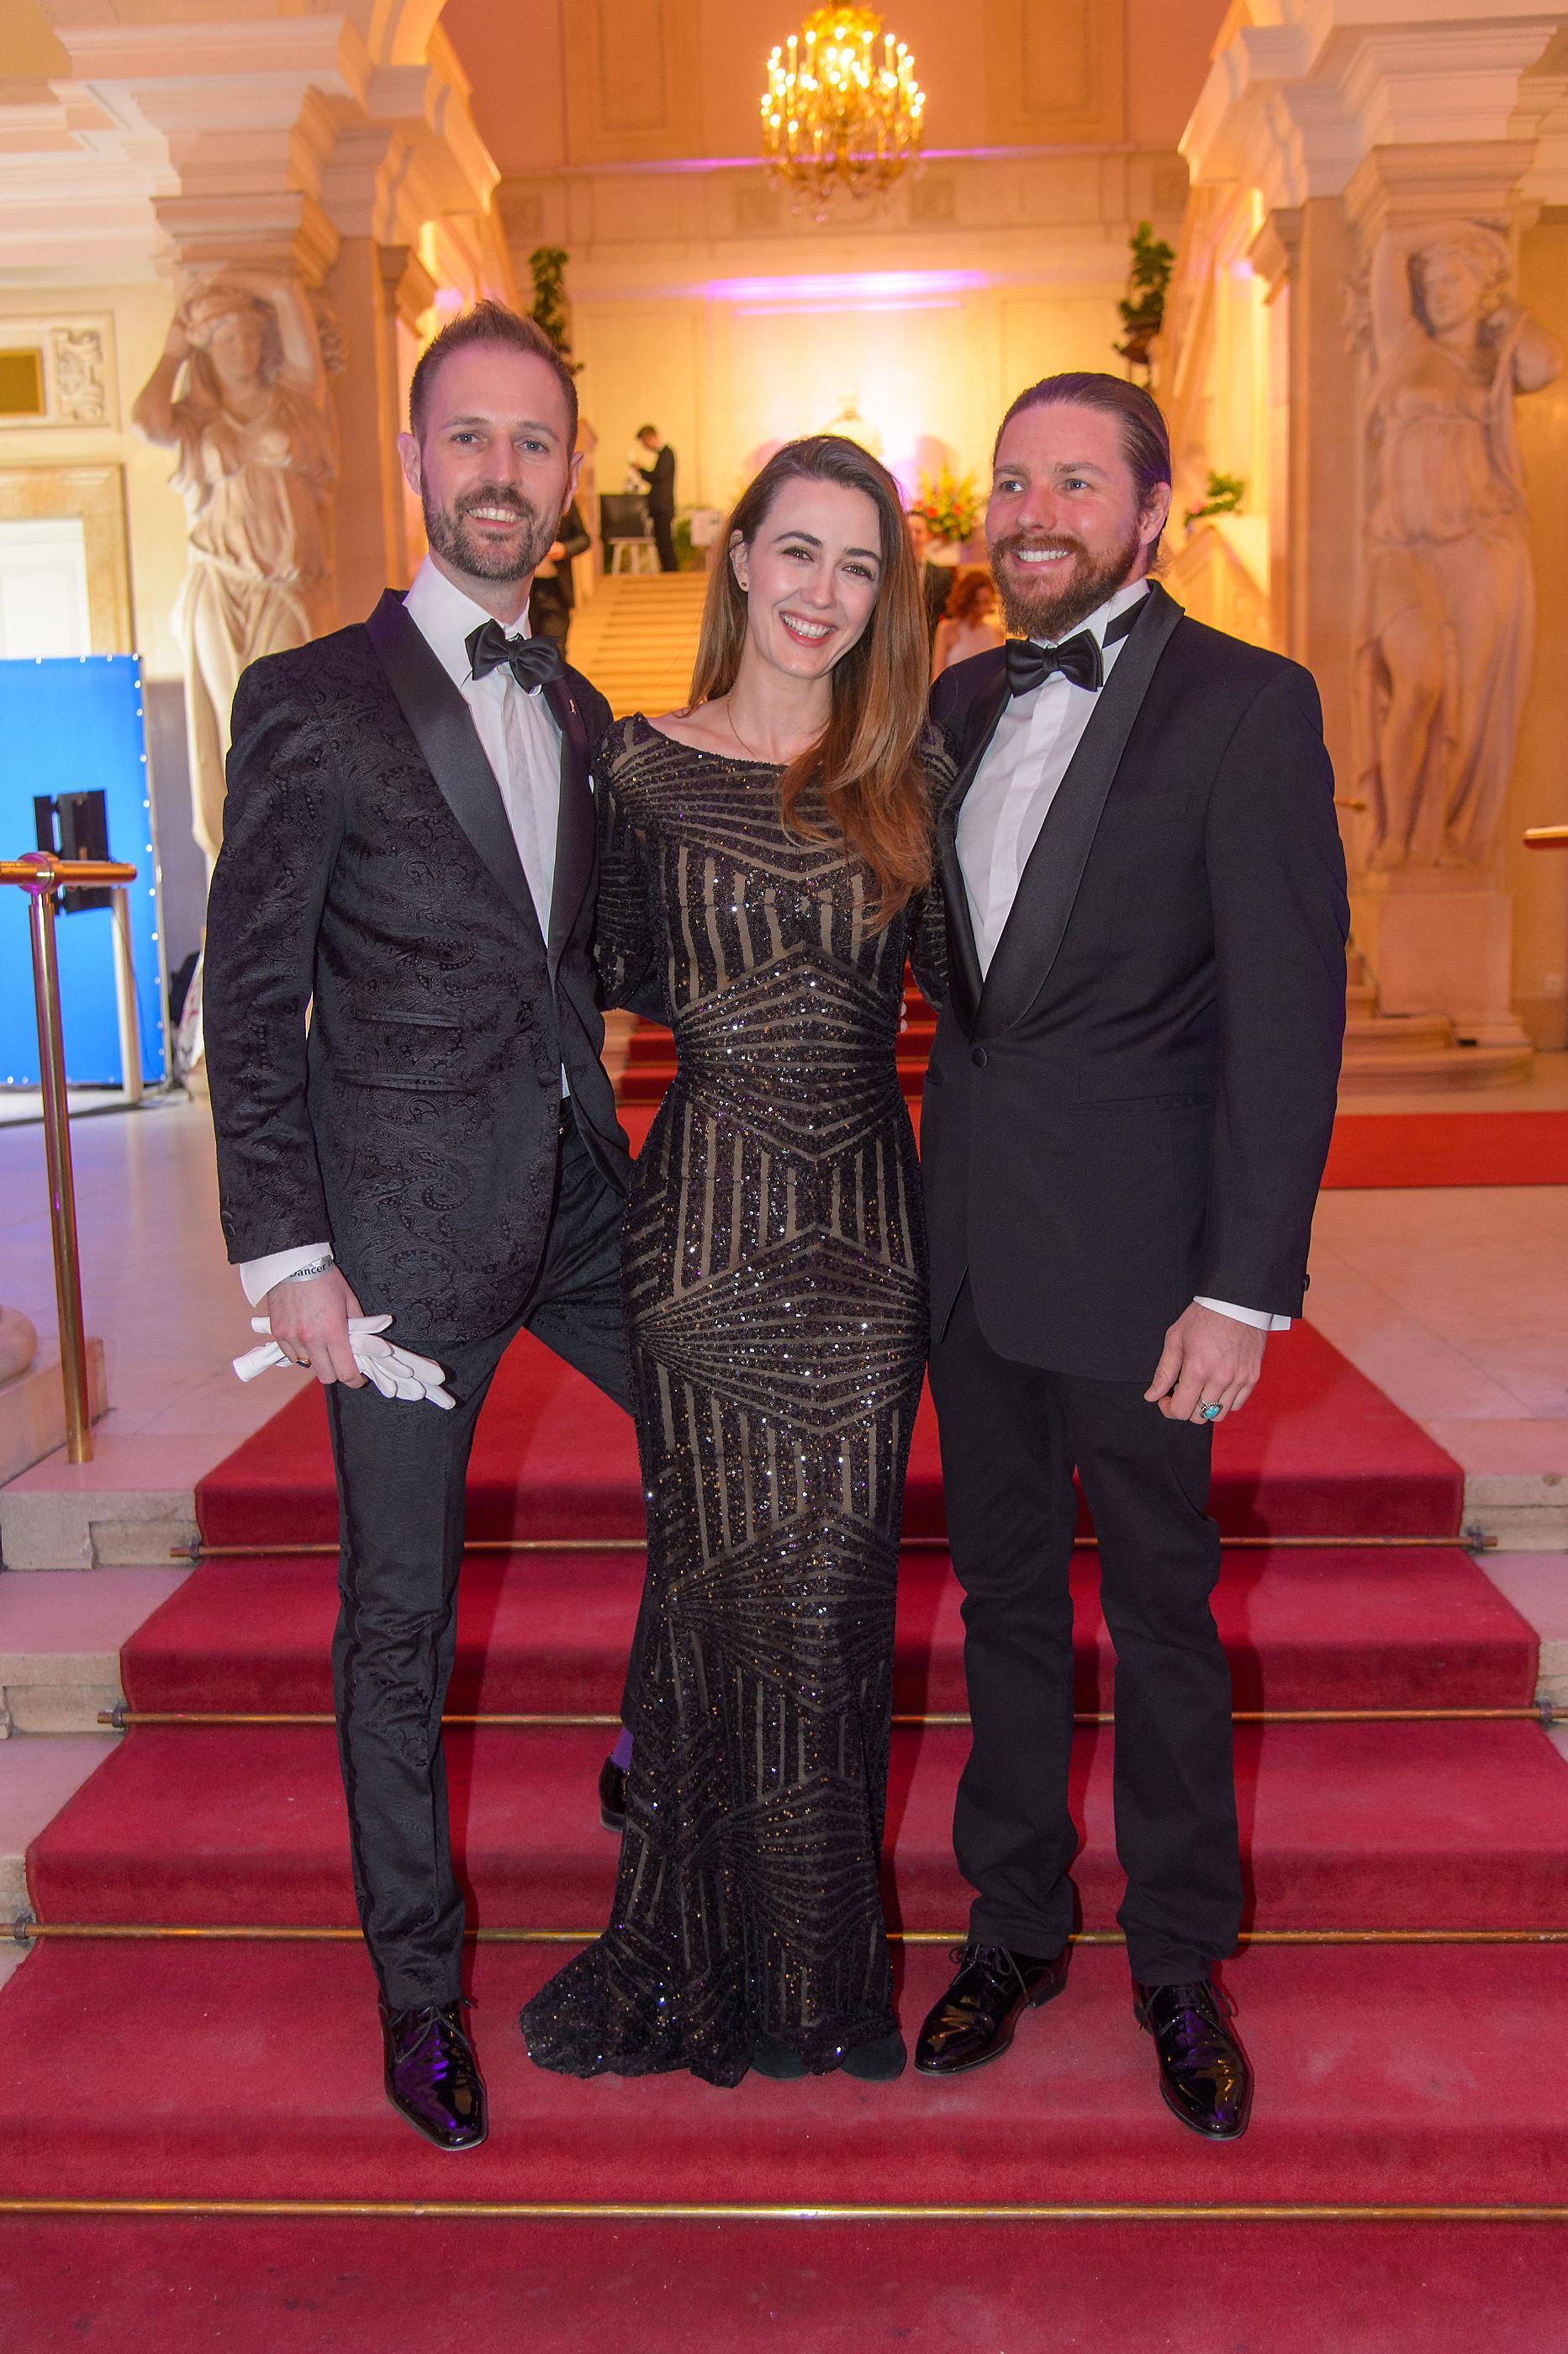 Madeline ZIMA, Matthias URRISK, Ryan Alexandre SNOW